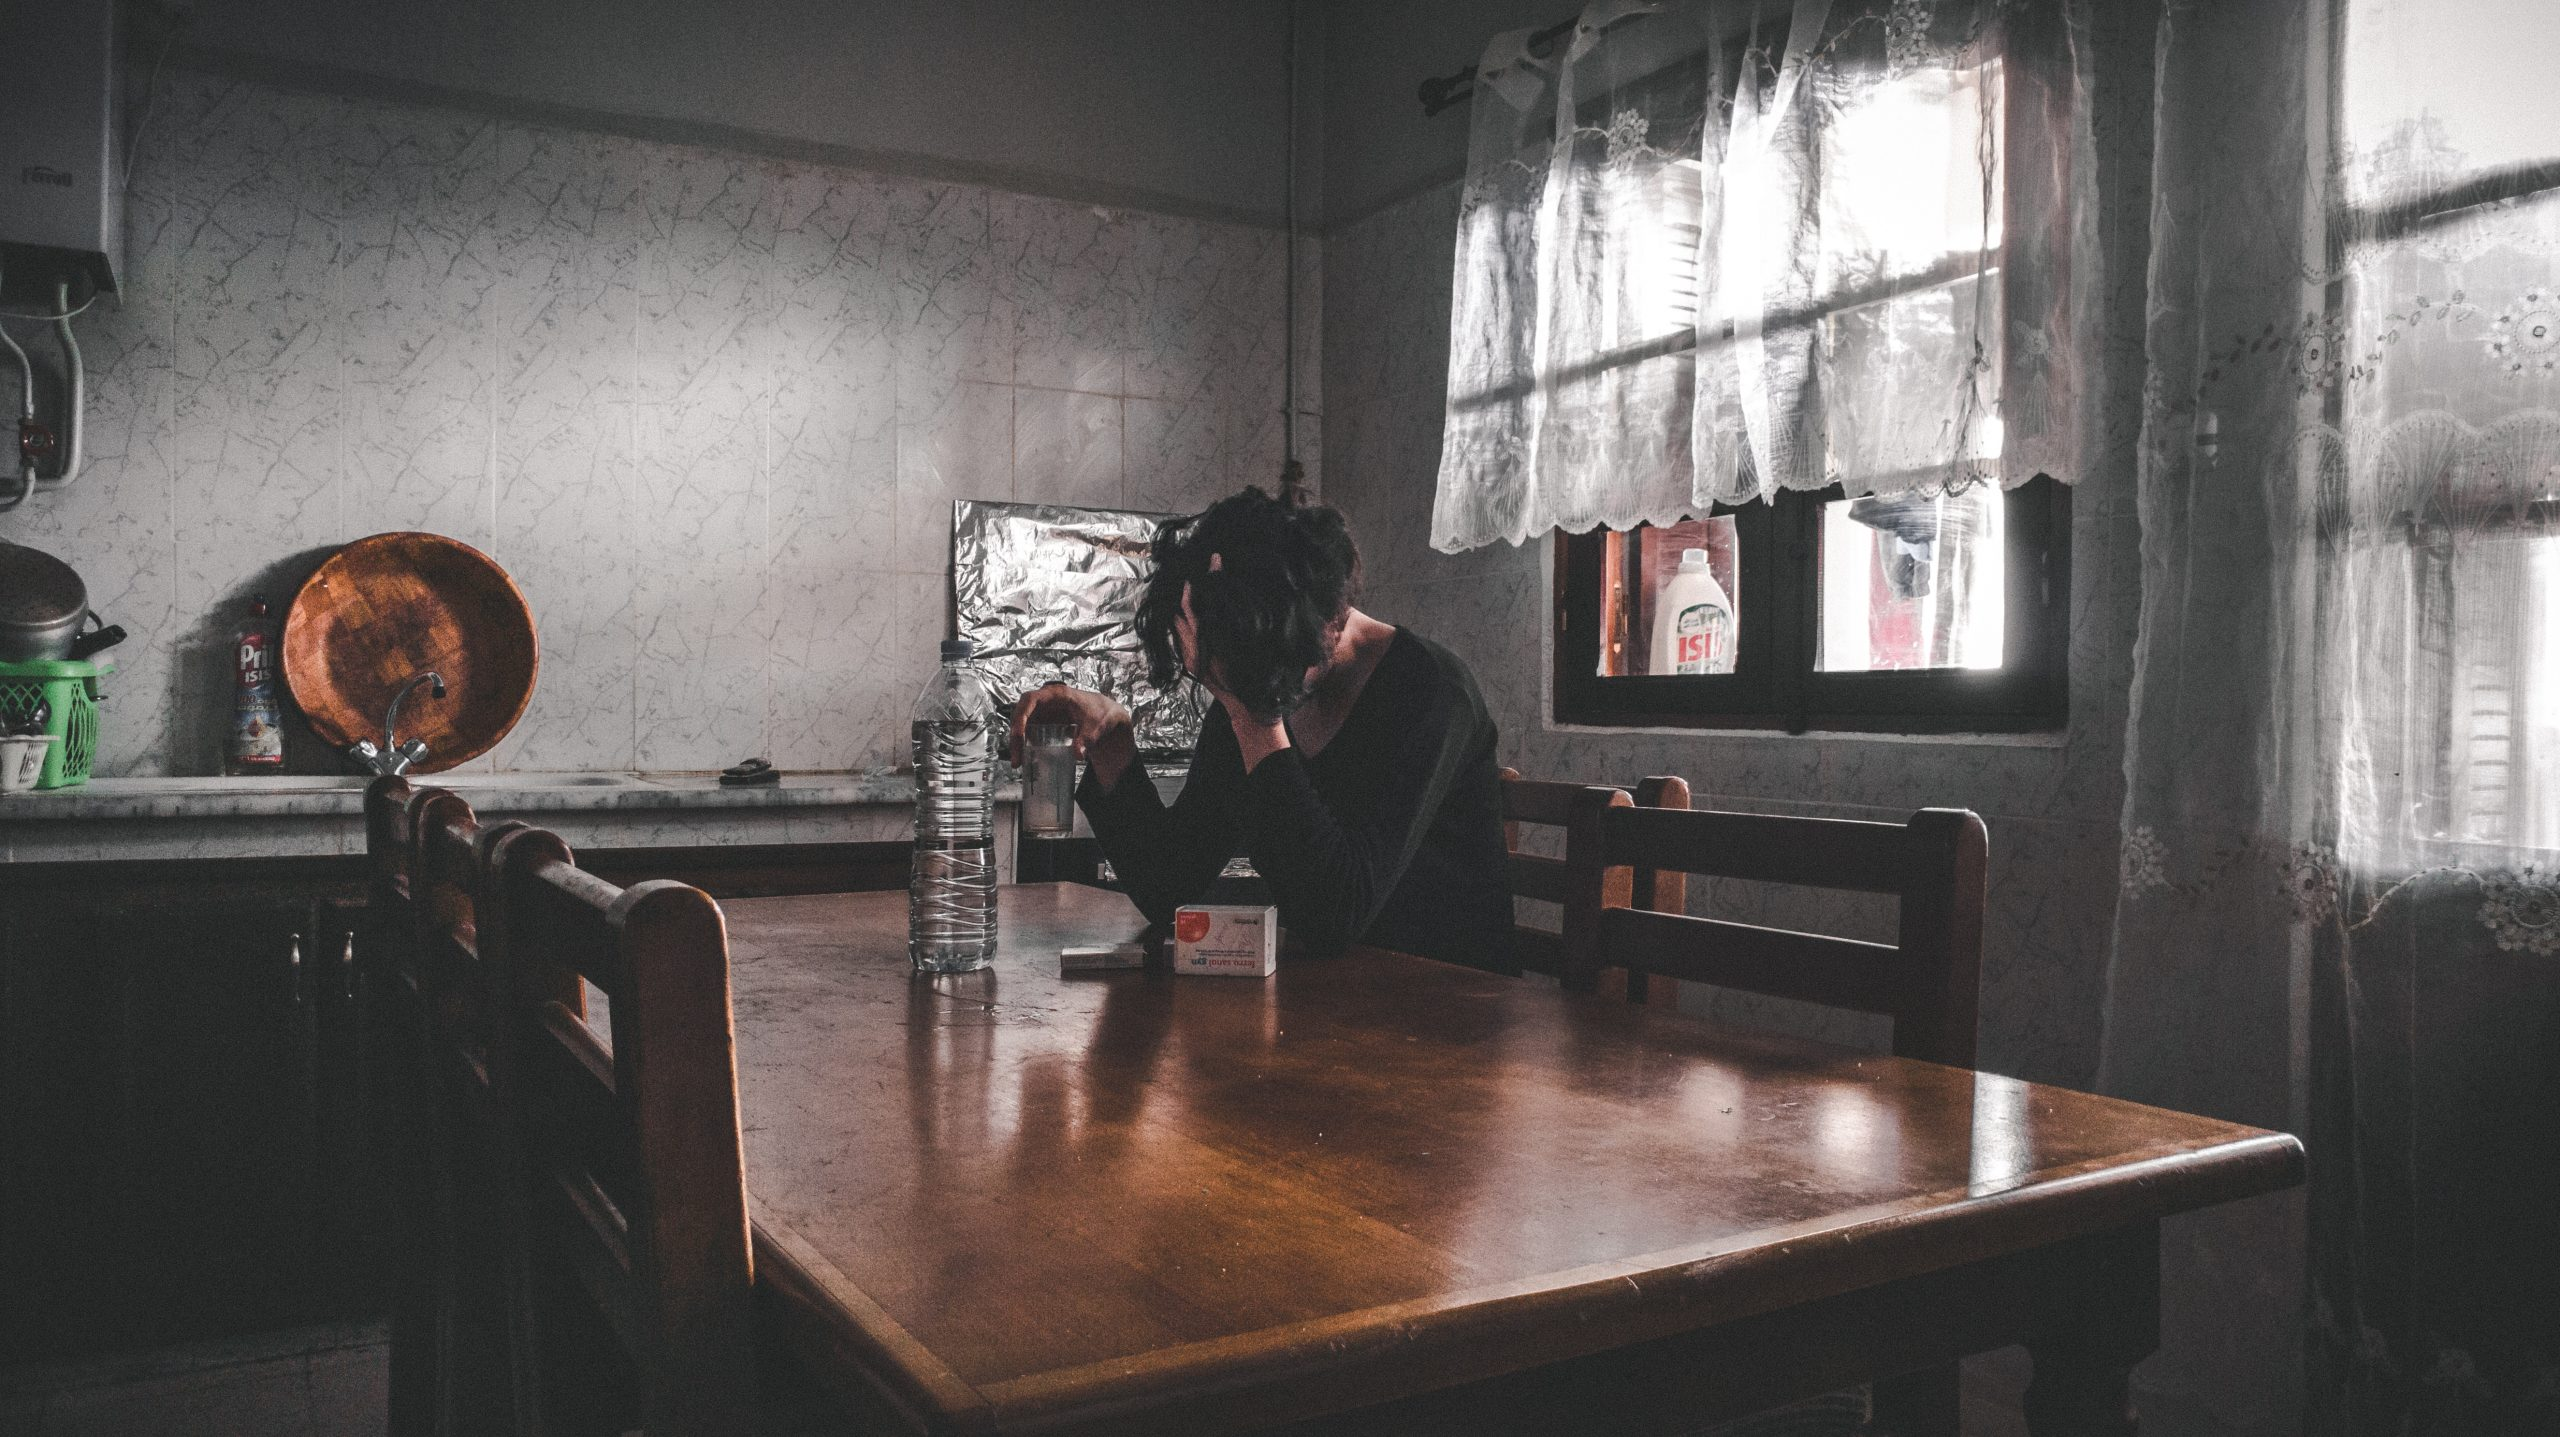 Woman sitting at a table looking sad